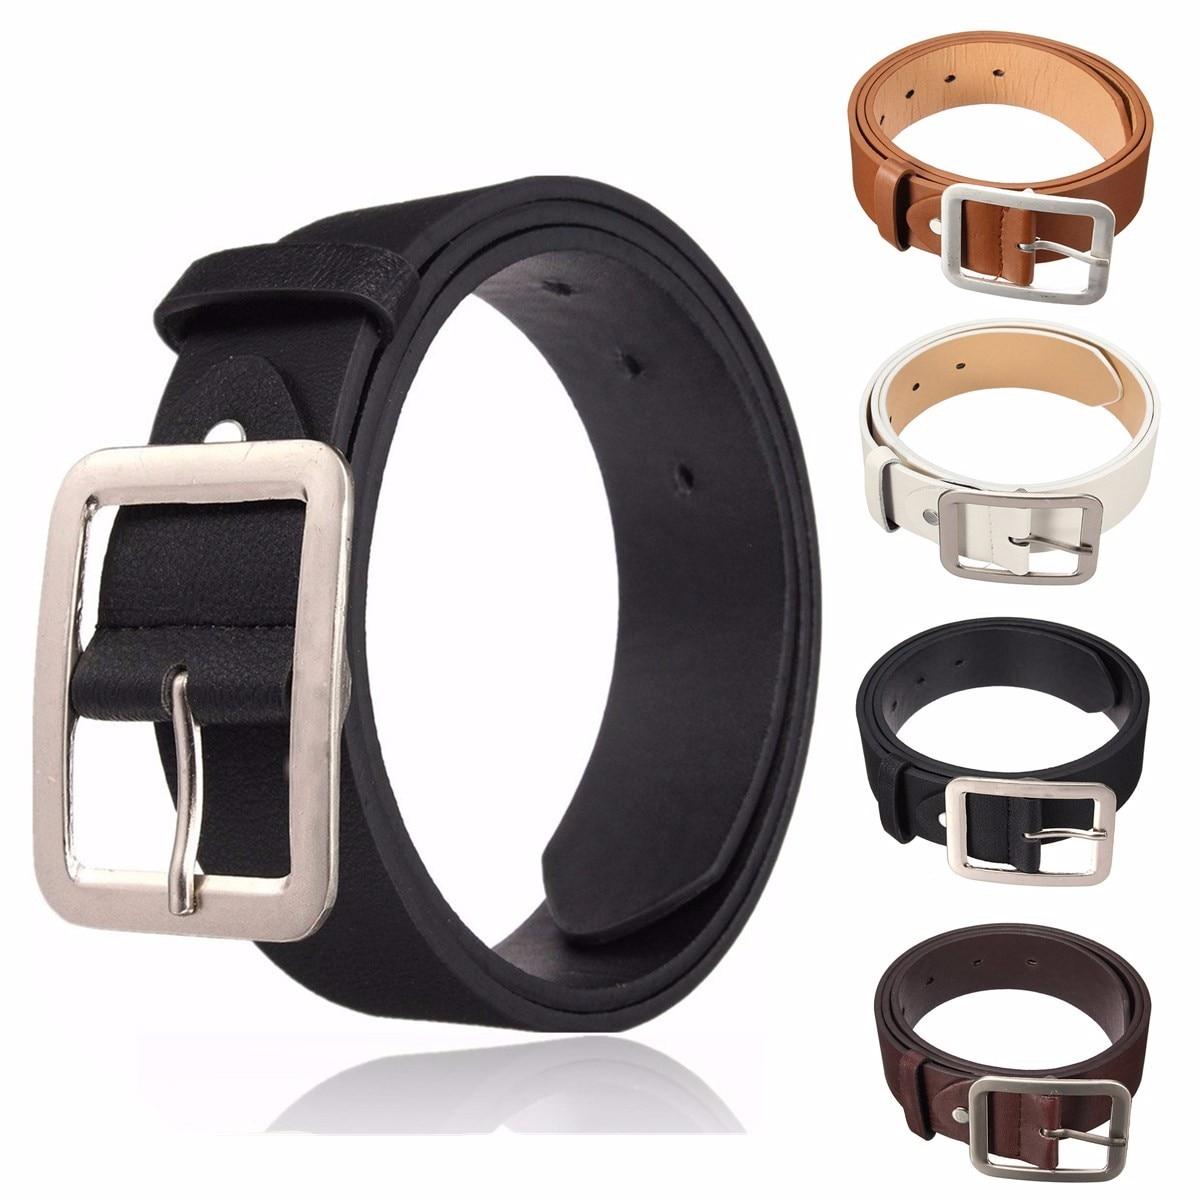 New Pin Buckle PU Leather Men   Belts   Retro Fashion Strap Male   Belts   Buckle Fancy Vintage Jeans cintos masculinos Men Waistband